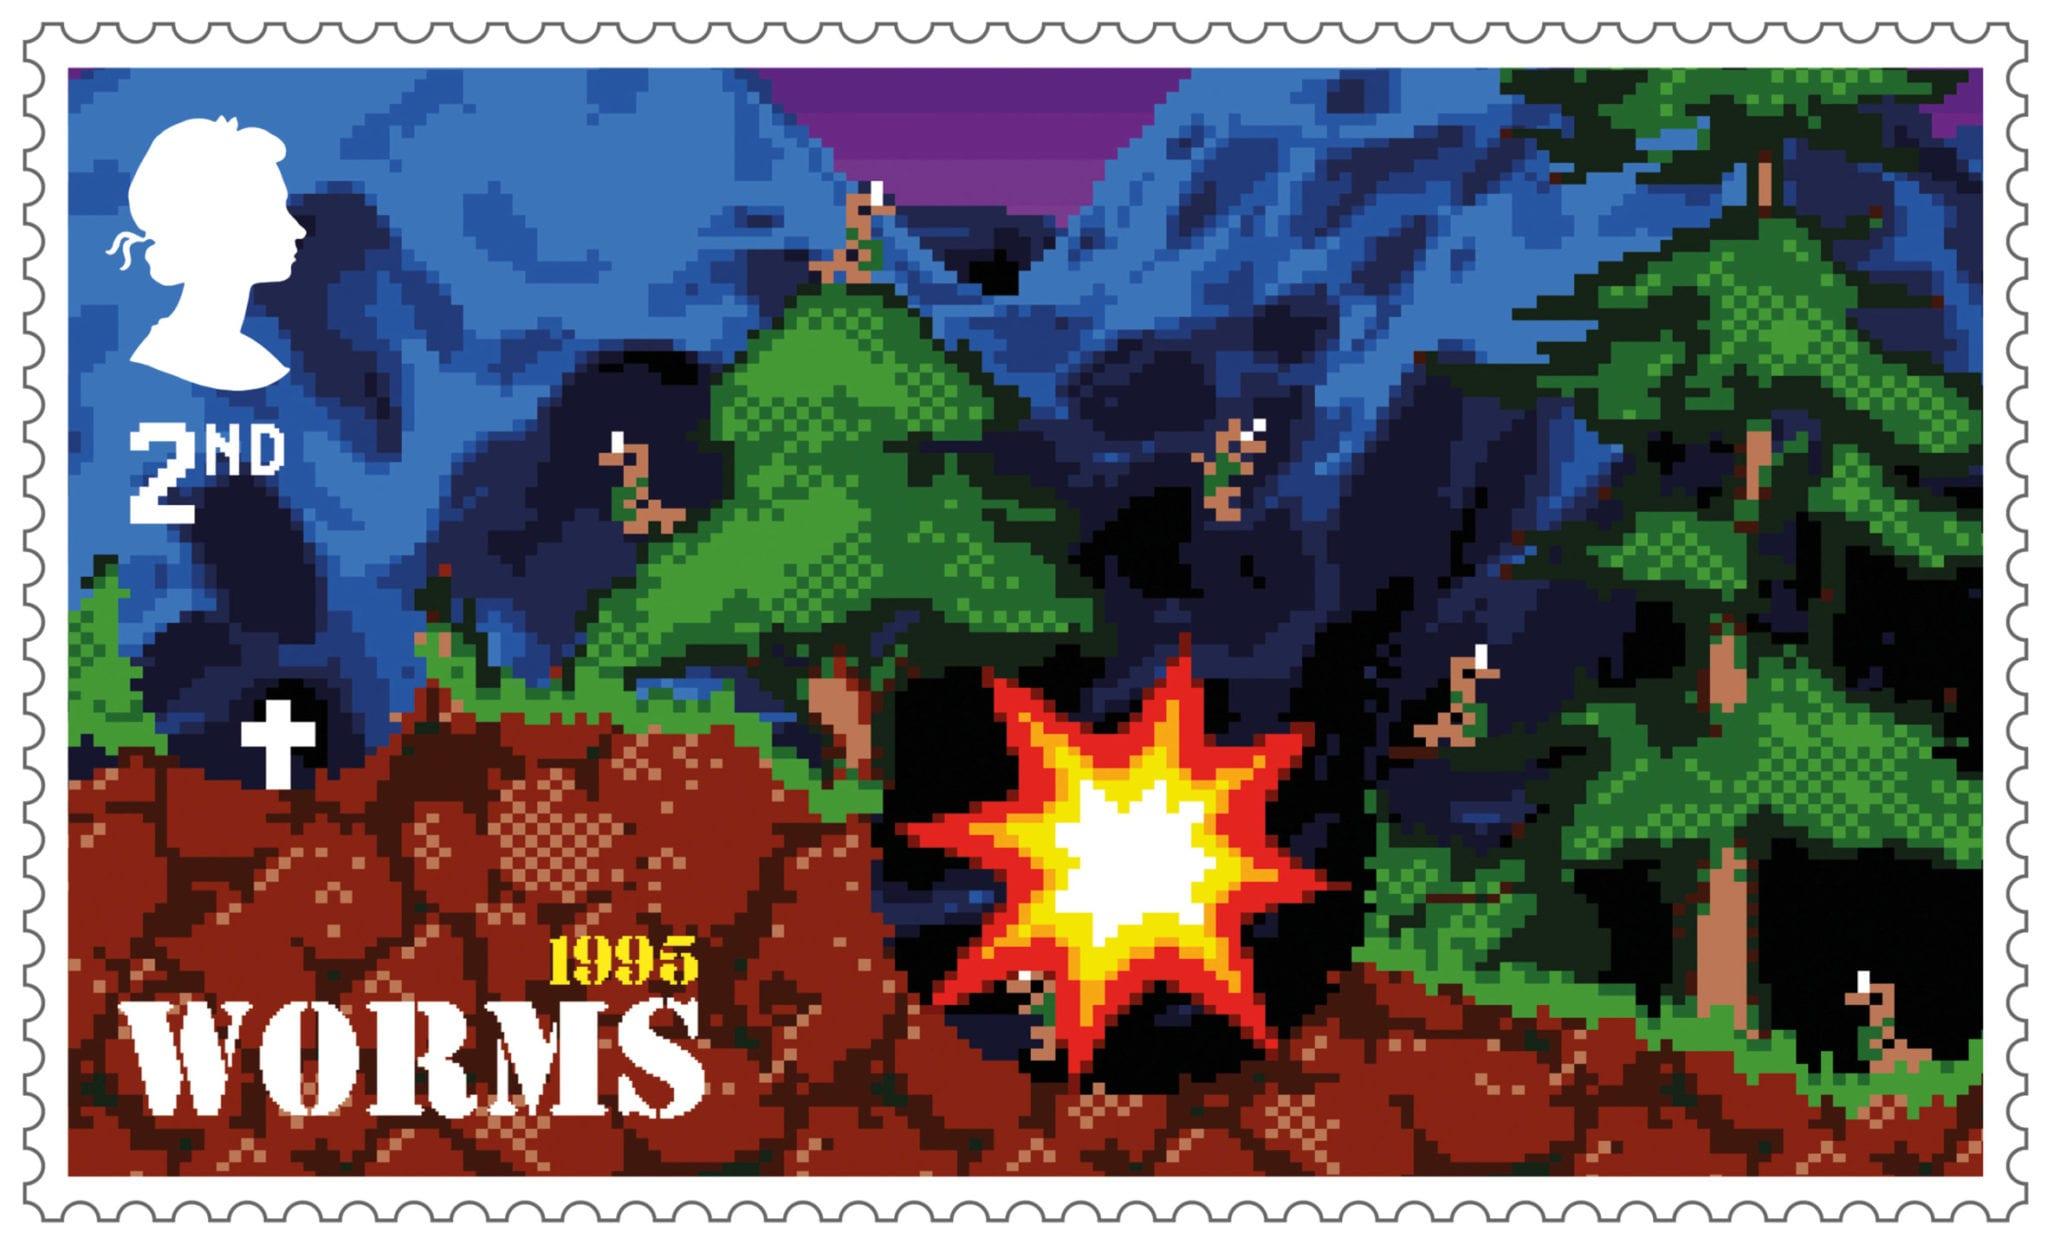 kráľovská pošta vzdáva hold ikonickým hrám 6 scaled - Kráľovská pošta vzdáva hold ikonickým hrám